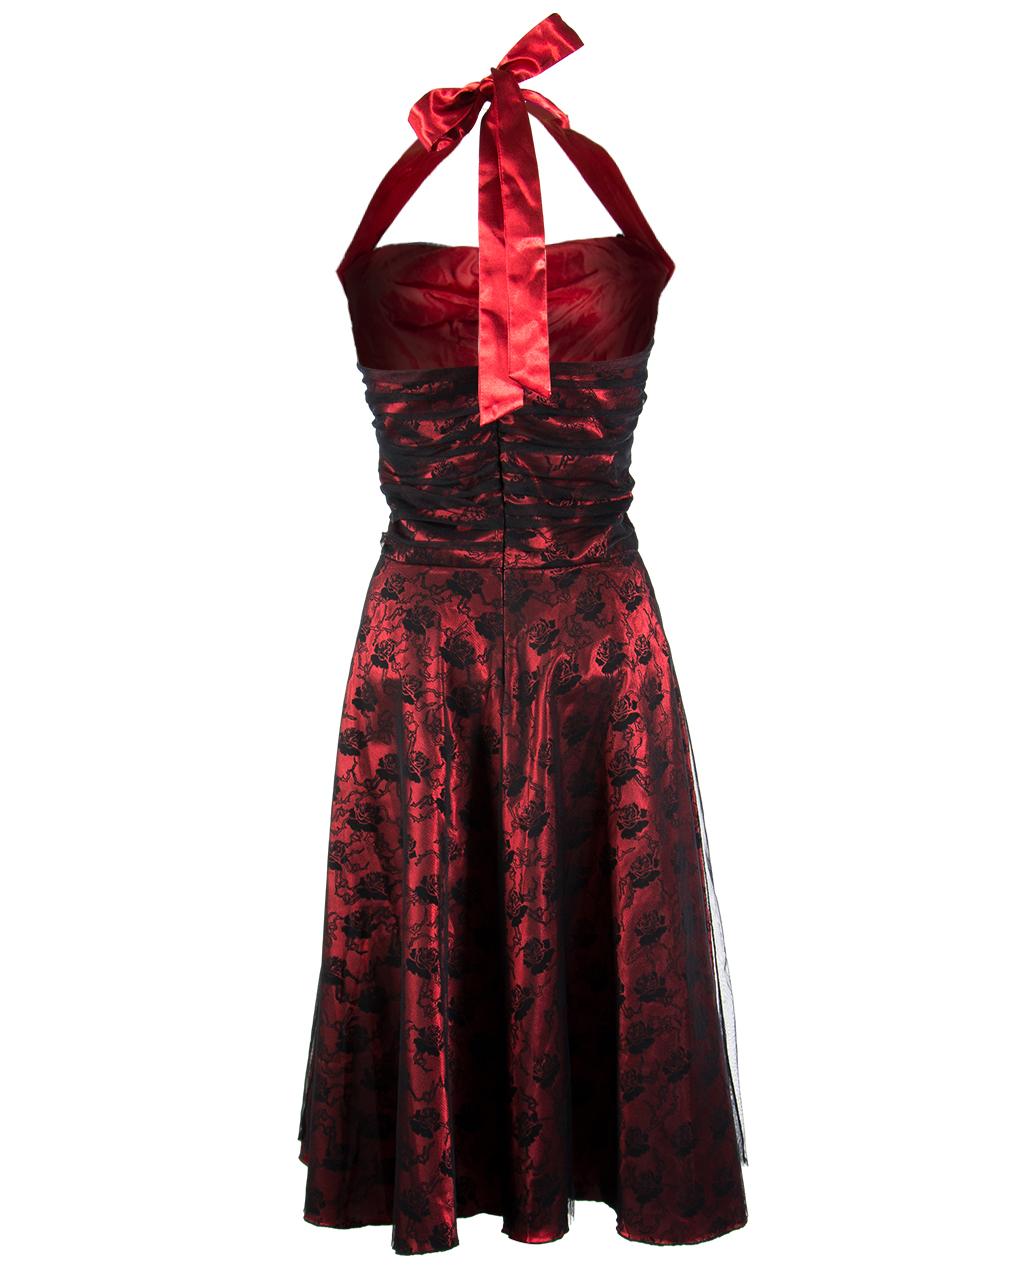 Gothic kleid schwarz kurz